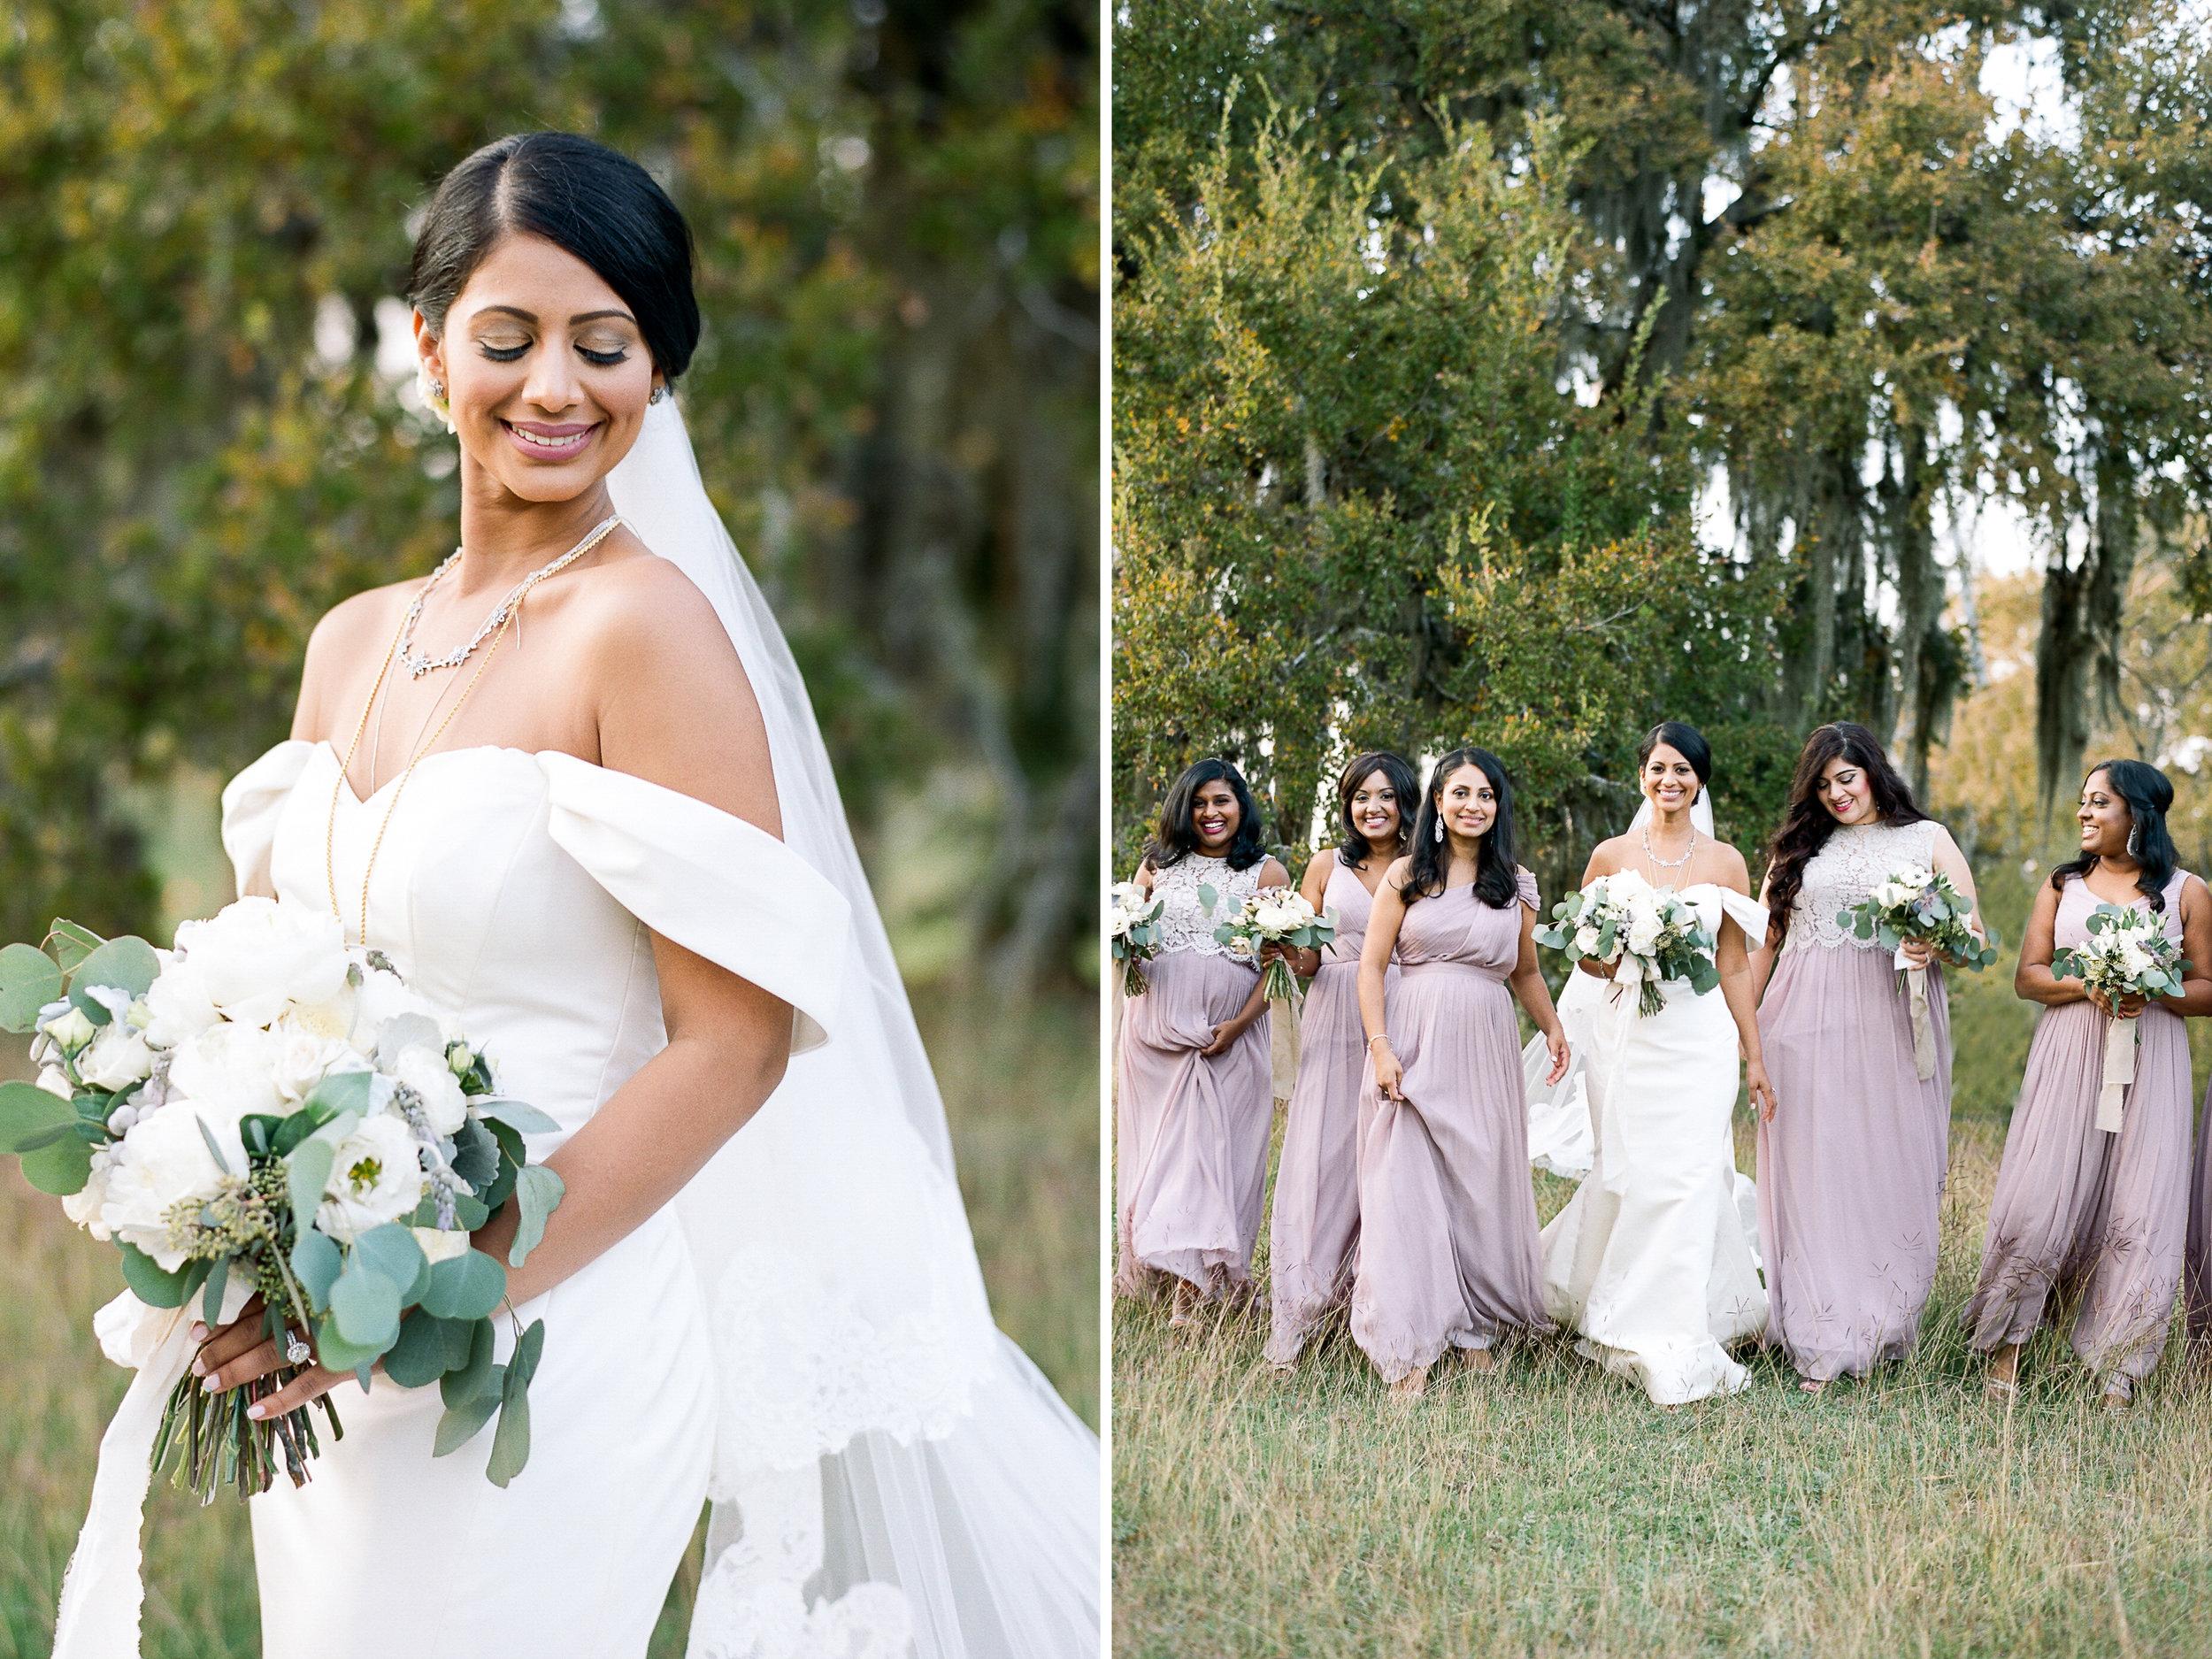 Fine-Art-Film-Houston-Wedding-Photographer-Best-Top-Luxury-Texas-Austin-Dallas-Destination-Dana-Fernandez-Photography-The-Bell-Tower-on-34th-Indian-9-109.jpg